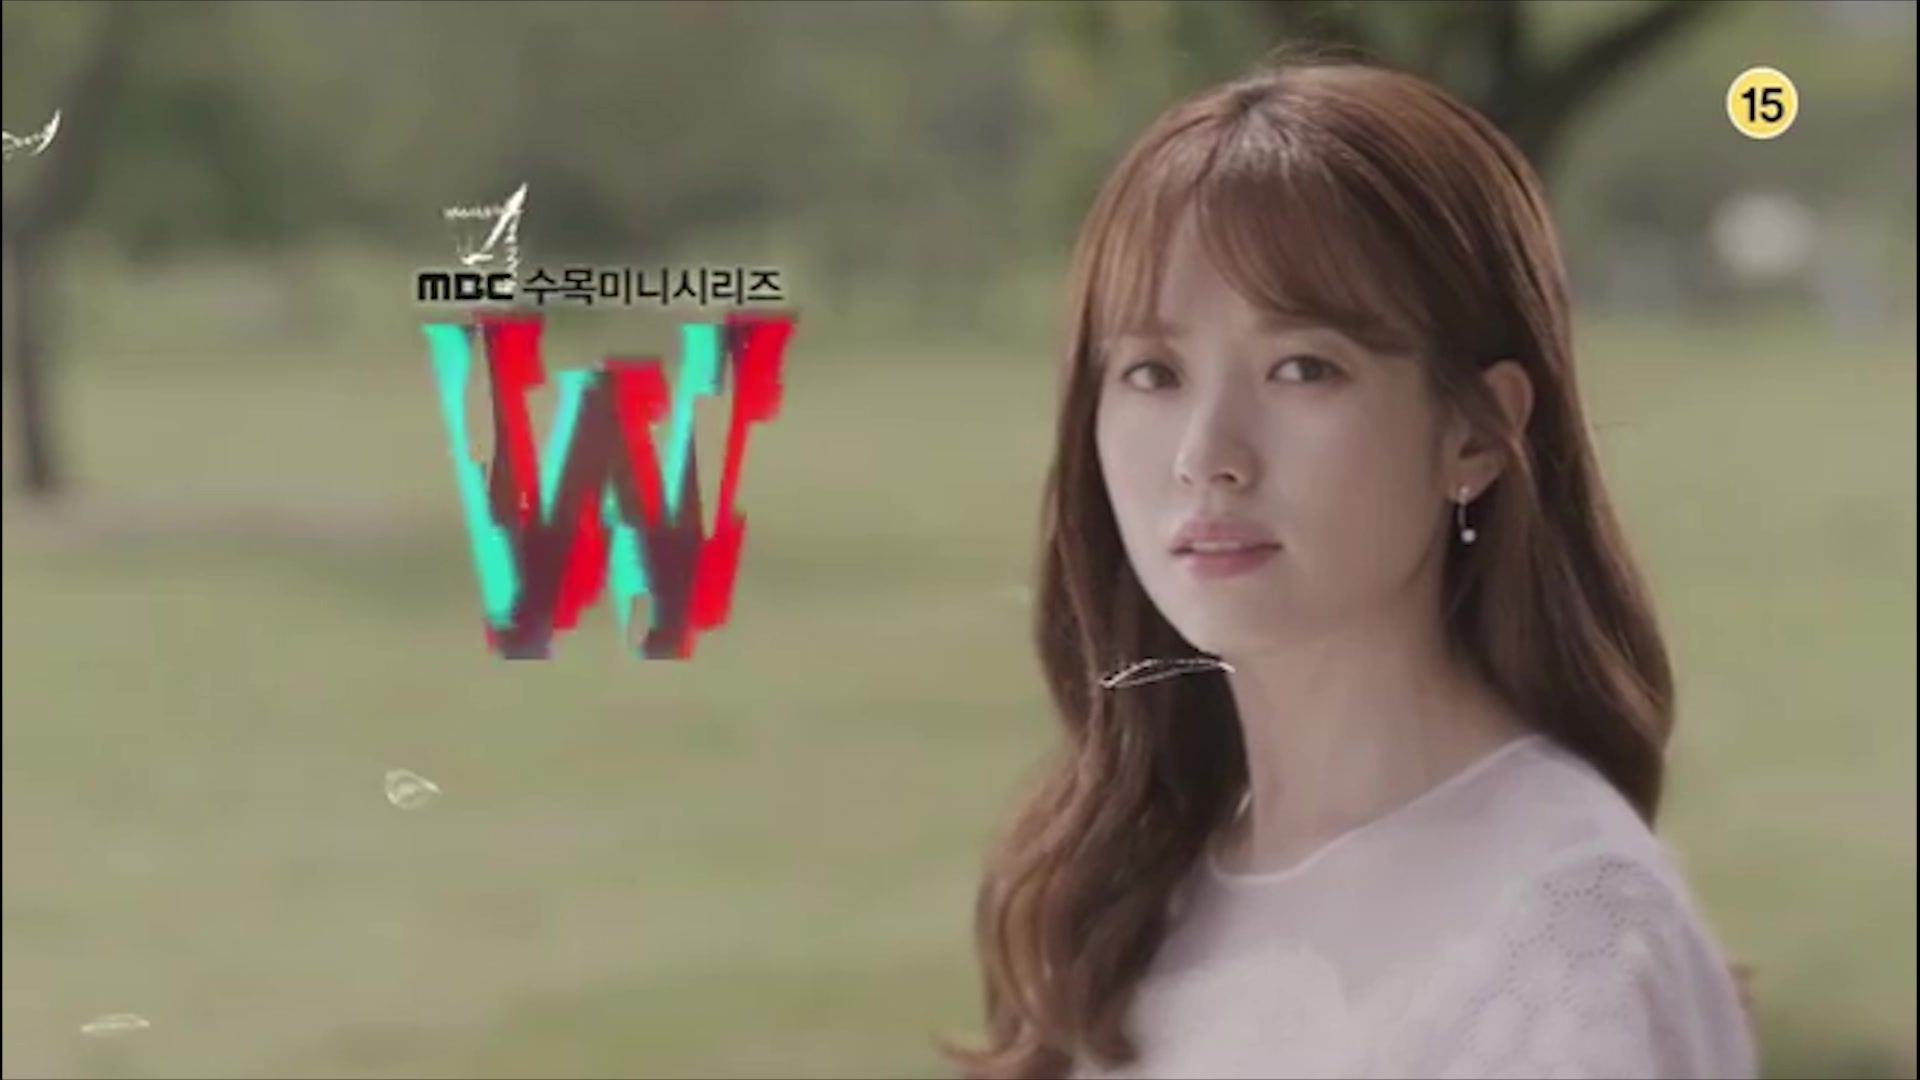 W Watch Full Episodes Free Korea Tv Shows Rakuten Viki